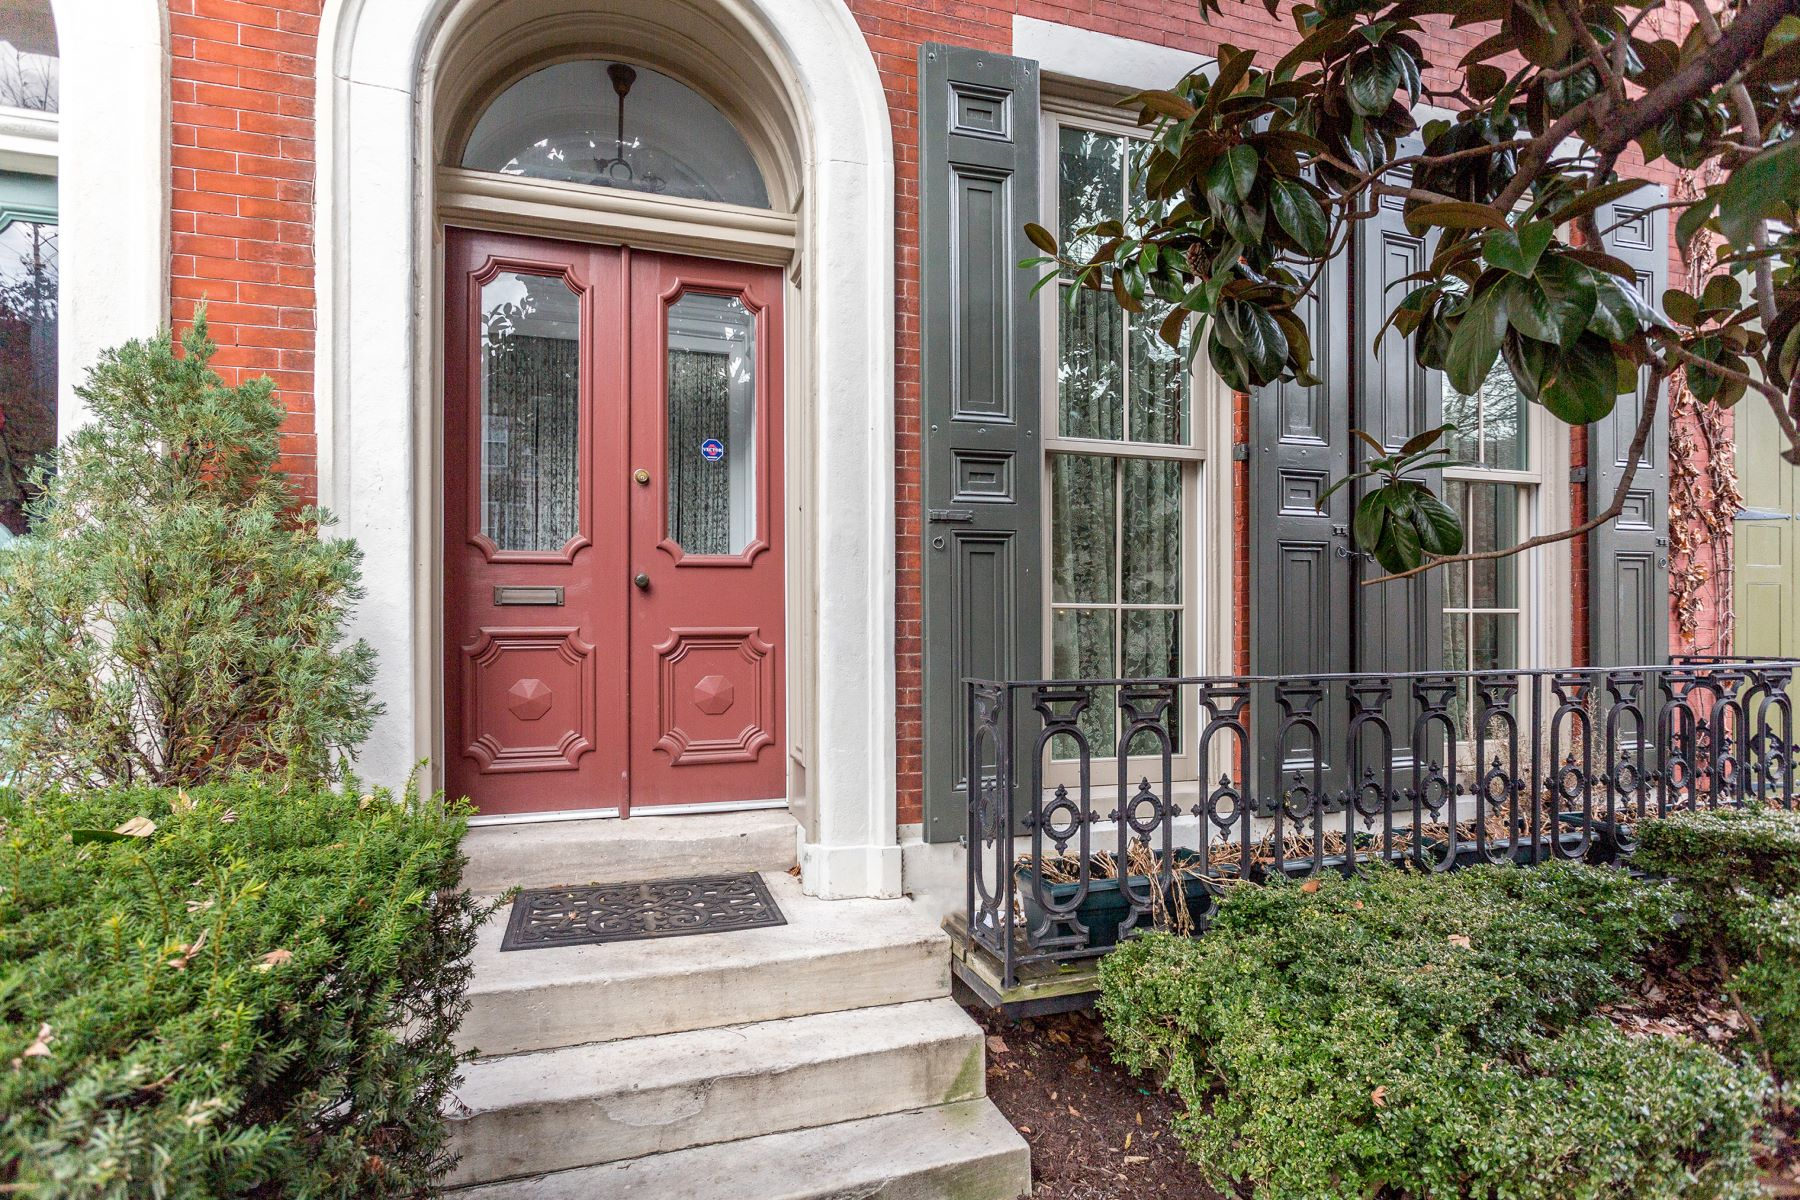 Single Family Home for Sale at 2125 Green St 2125 GREEN ST Philadelphia, Pennsylvania 19130 United States